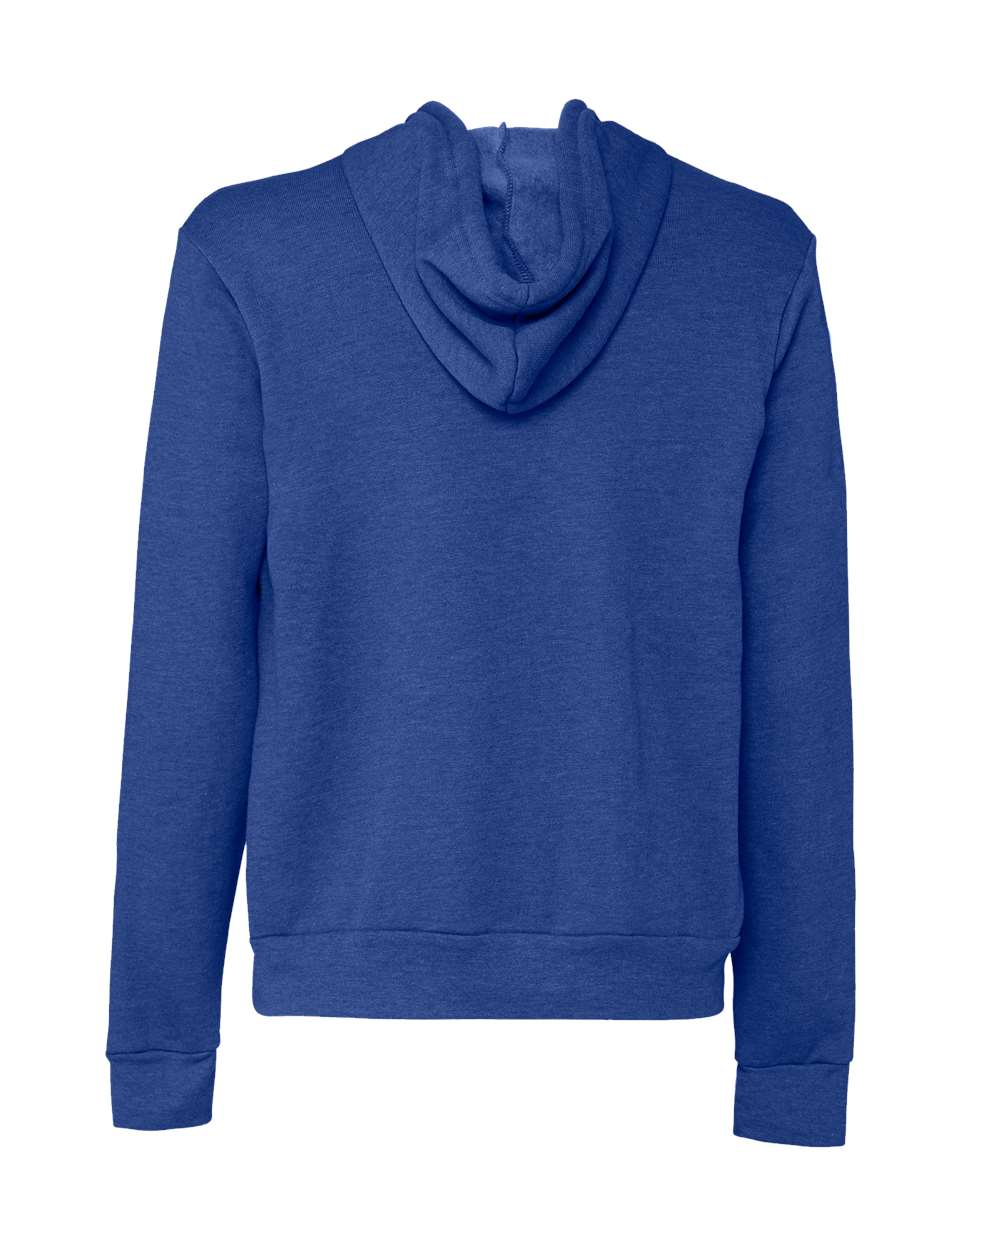 Bella-Canvas-Unisex-Full-Zip-Up-Hooded-Sweatshirt-Blank-Hoodie-3739-up-to-3XL thumbnail 61